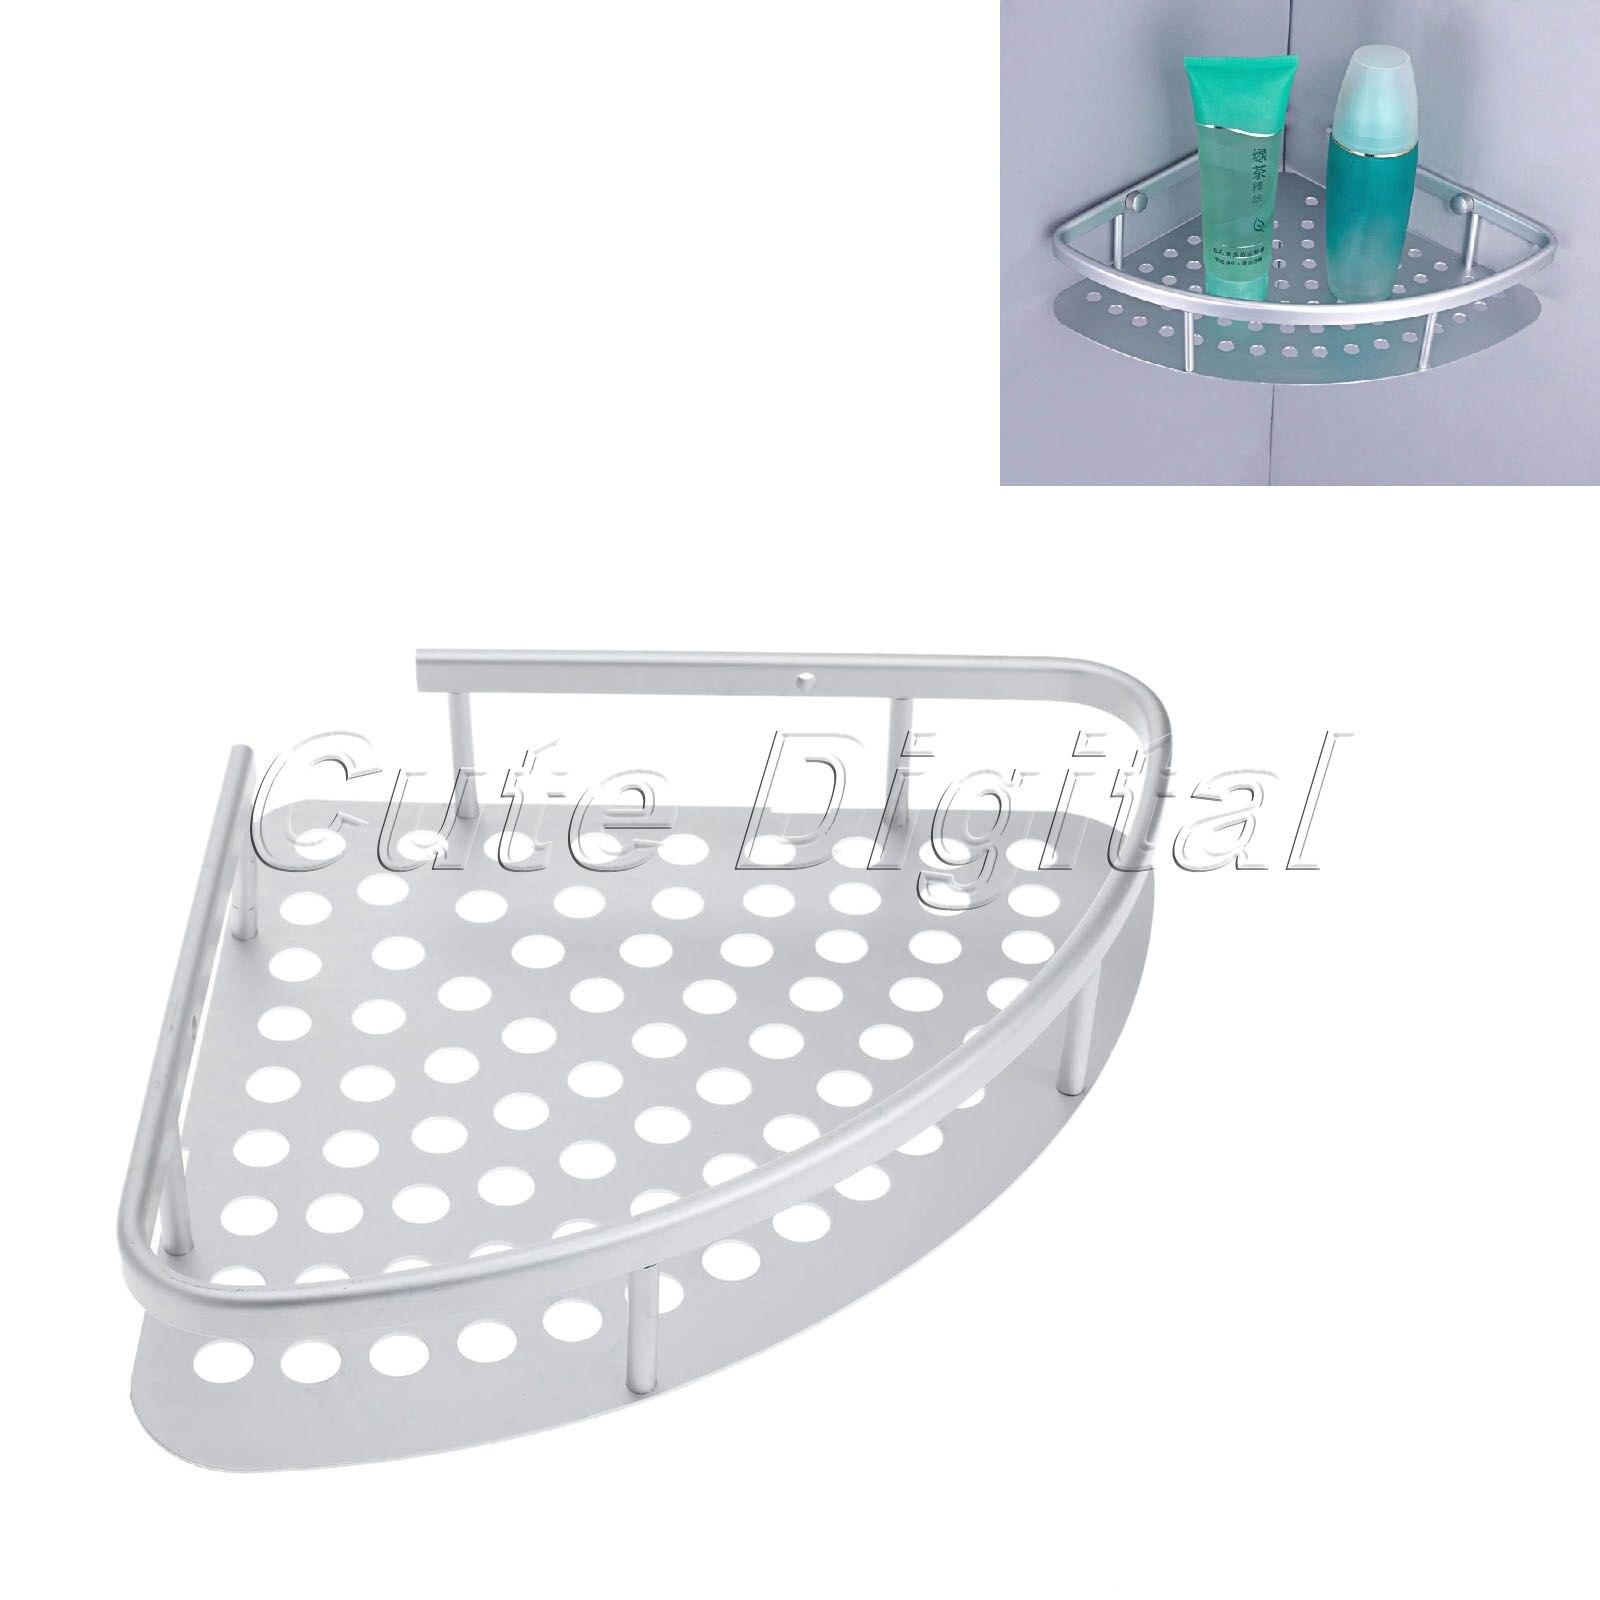 Aluminum Bathroom Shelf Bath Shampoo Basket Wall Mounted Bathroom ...